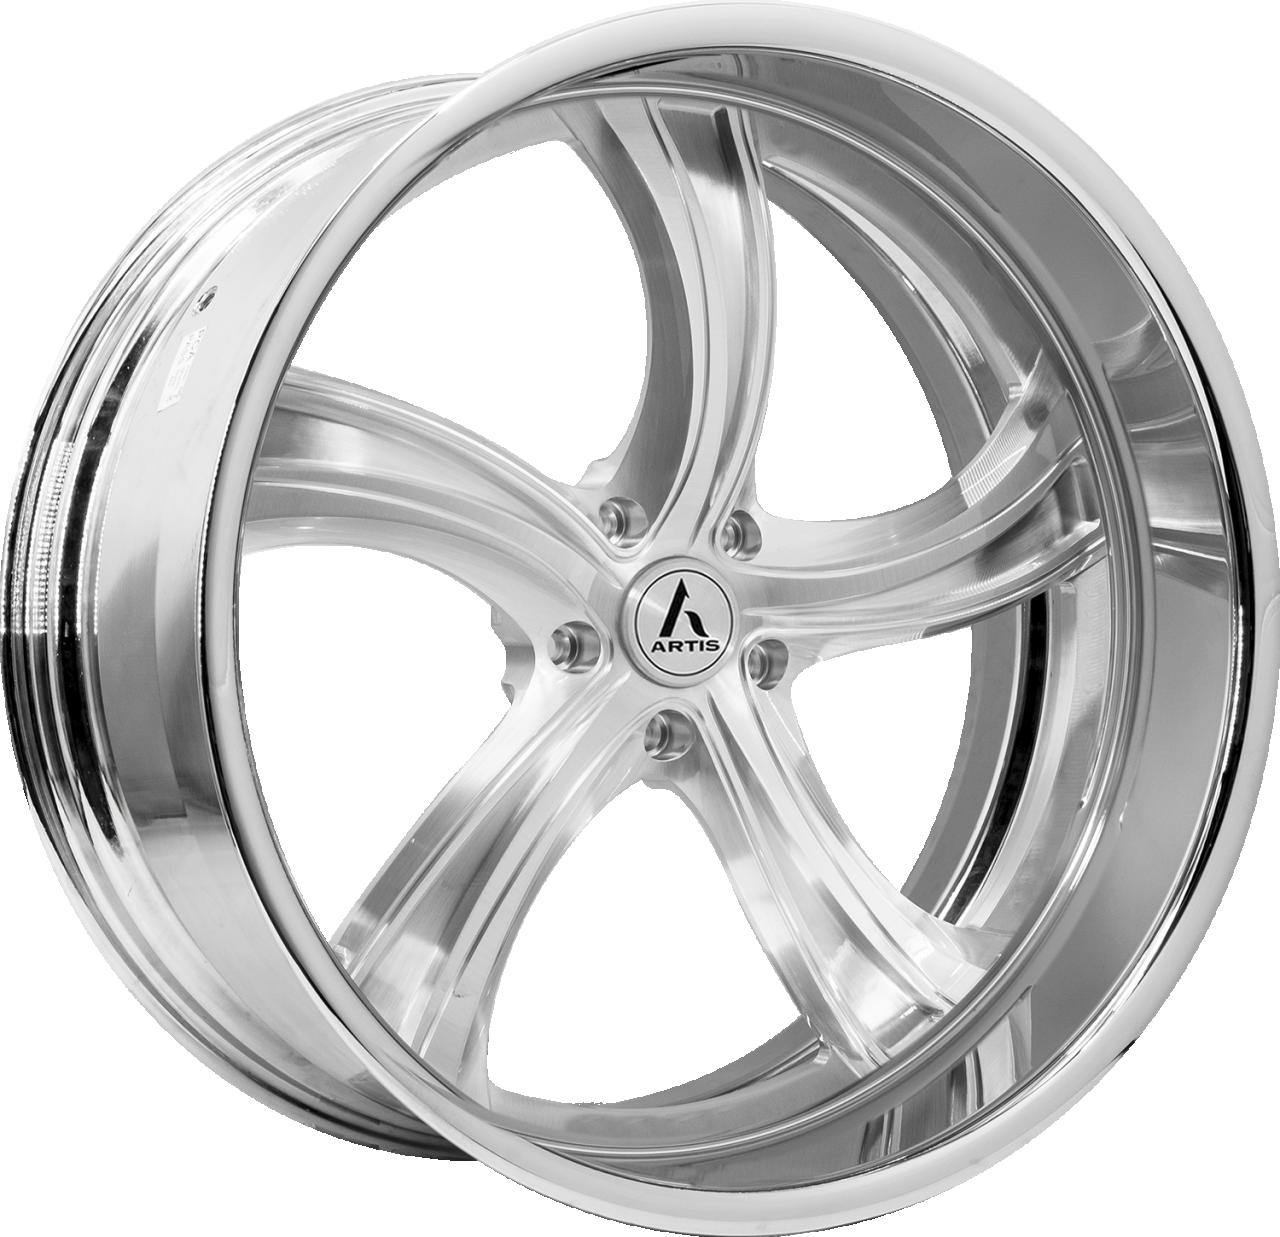 Artis Forged Kokomo-M wheel with Brushed finish